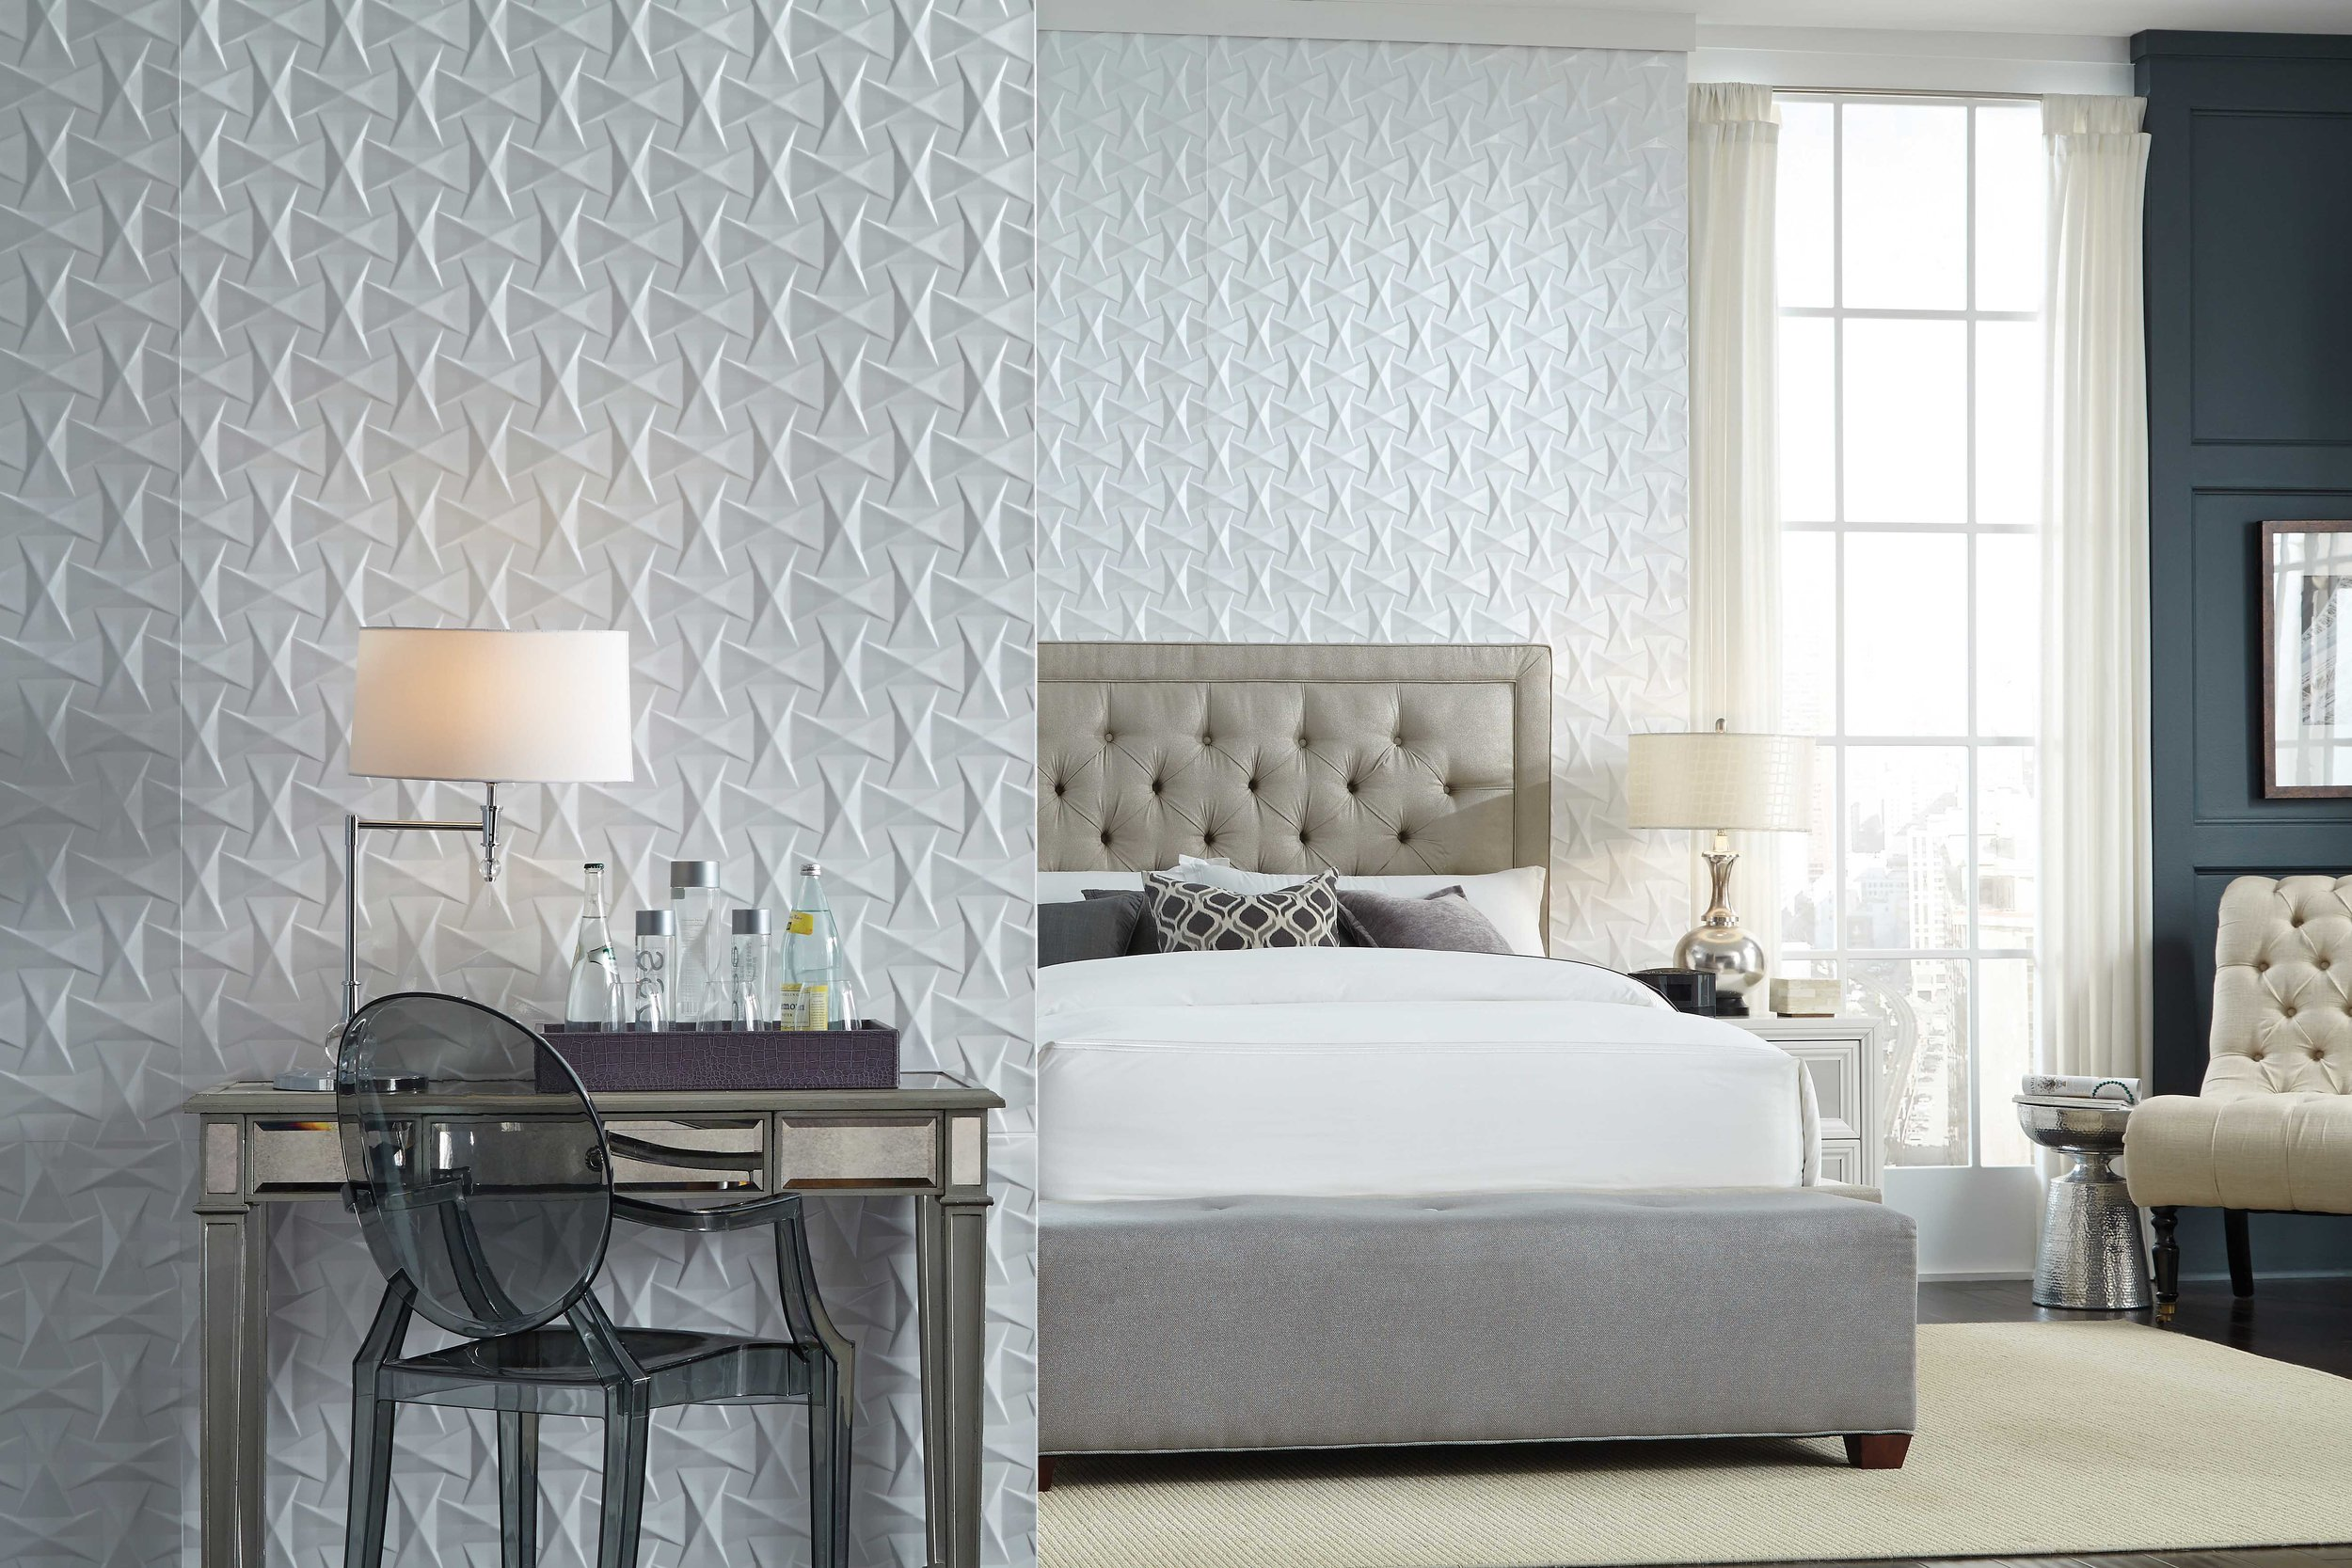 MF Walls_Bowtie Gloss White Paintable_Hotel Room 1.jpg